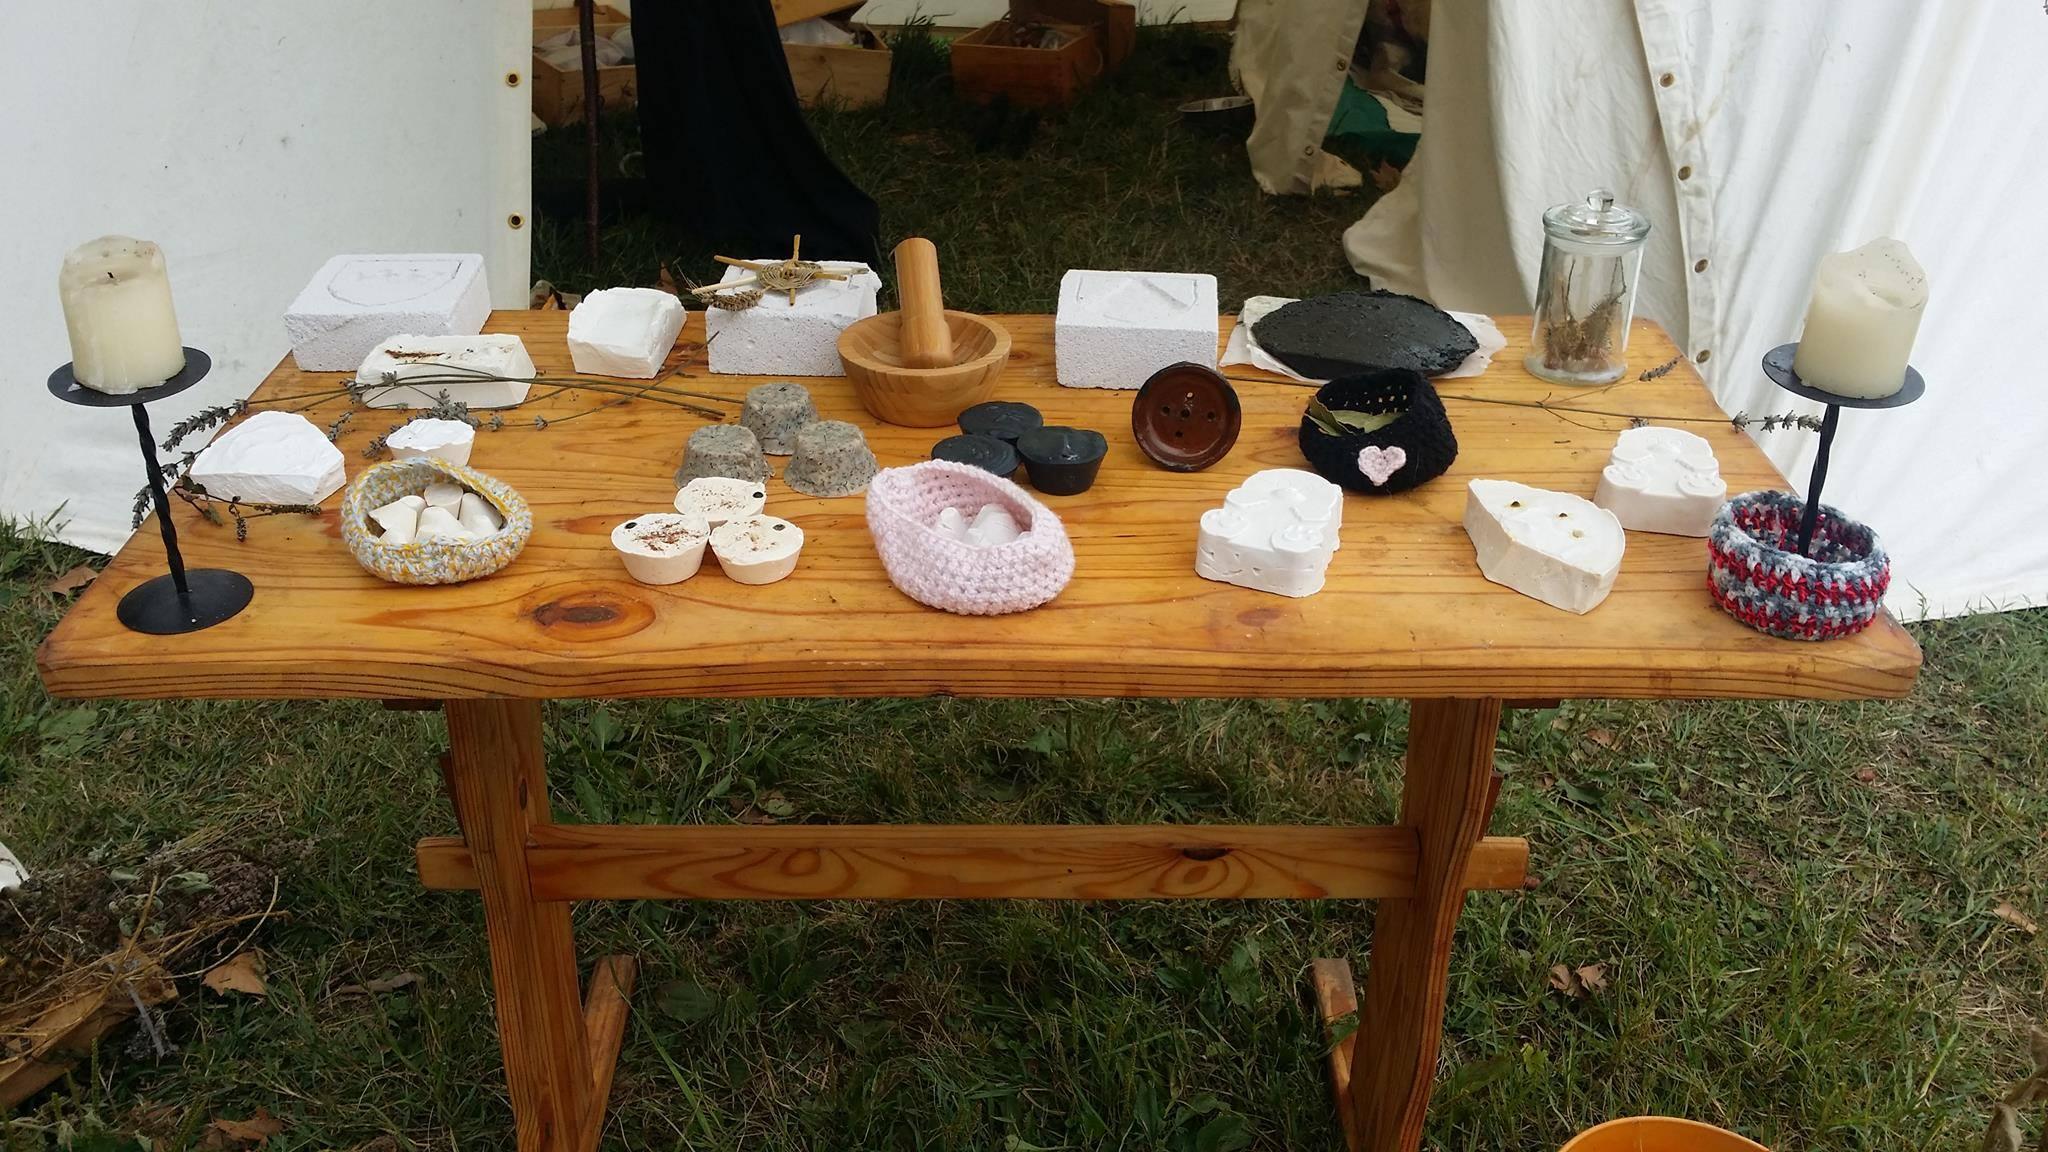 Fabrication artisanale de savon